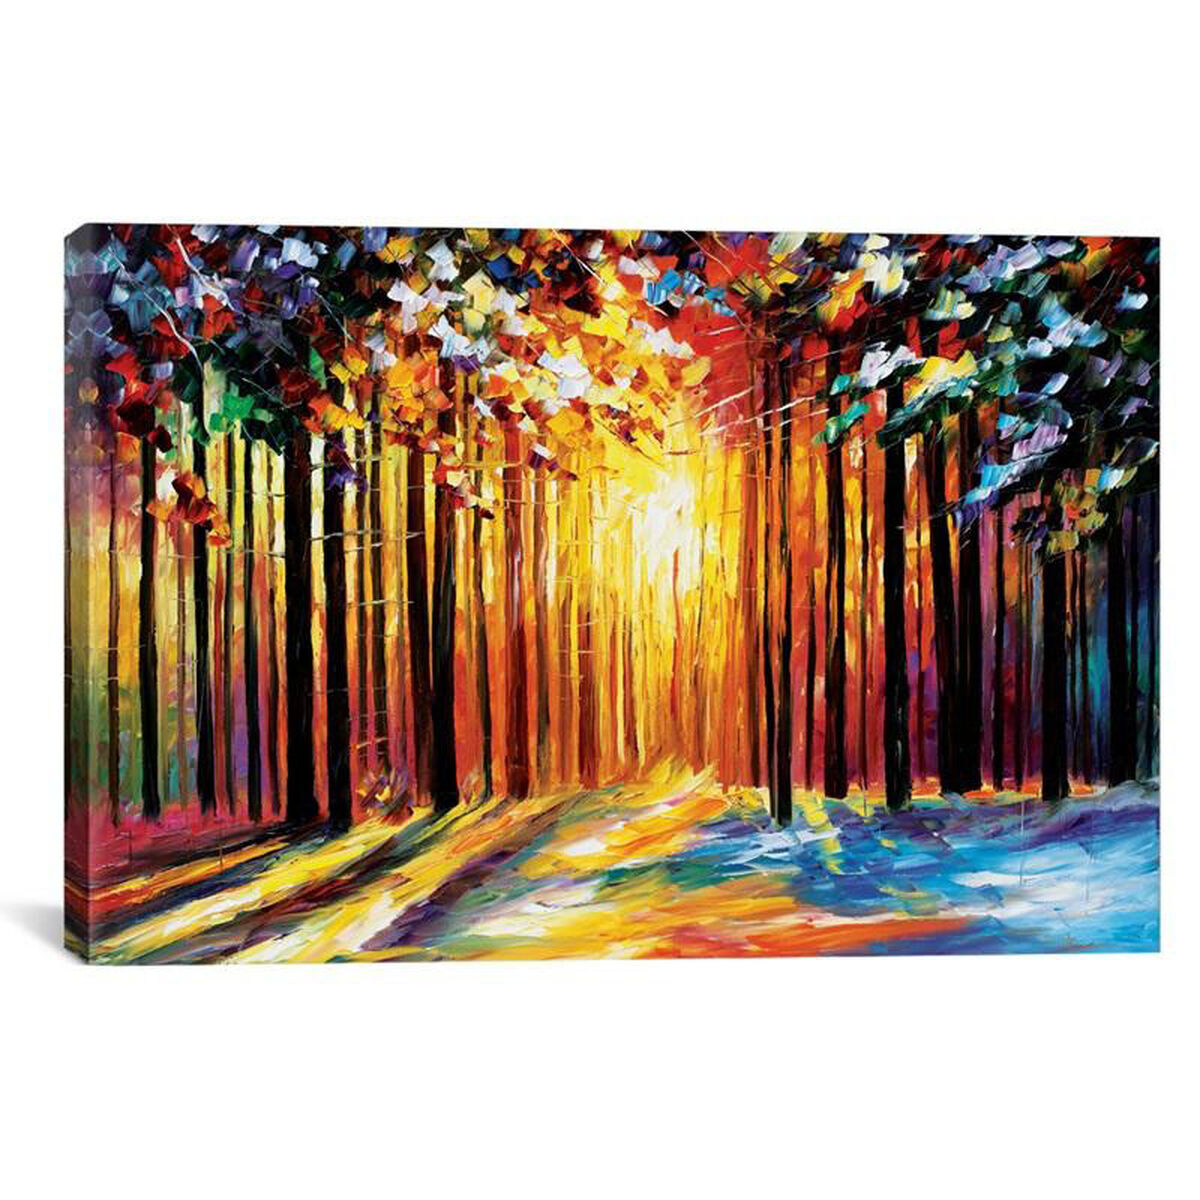 canvas artwork floating frame lea84 1pc6 40x26 ff01